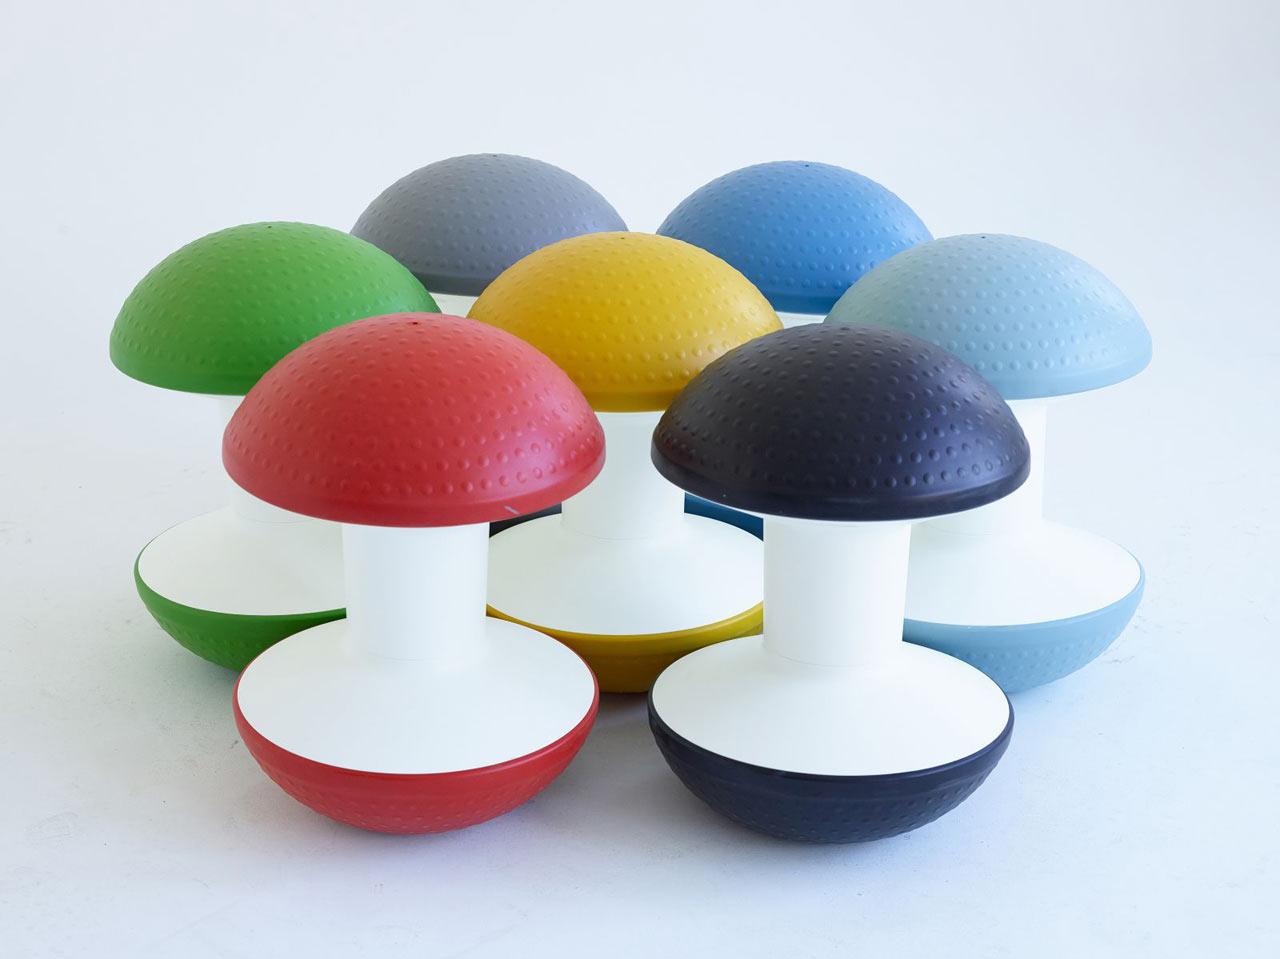 Ergonomic Ball Chair - The Ergo Chair